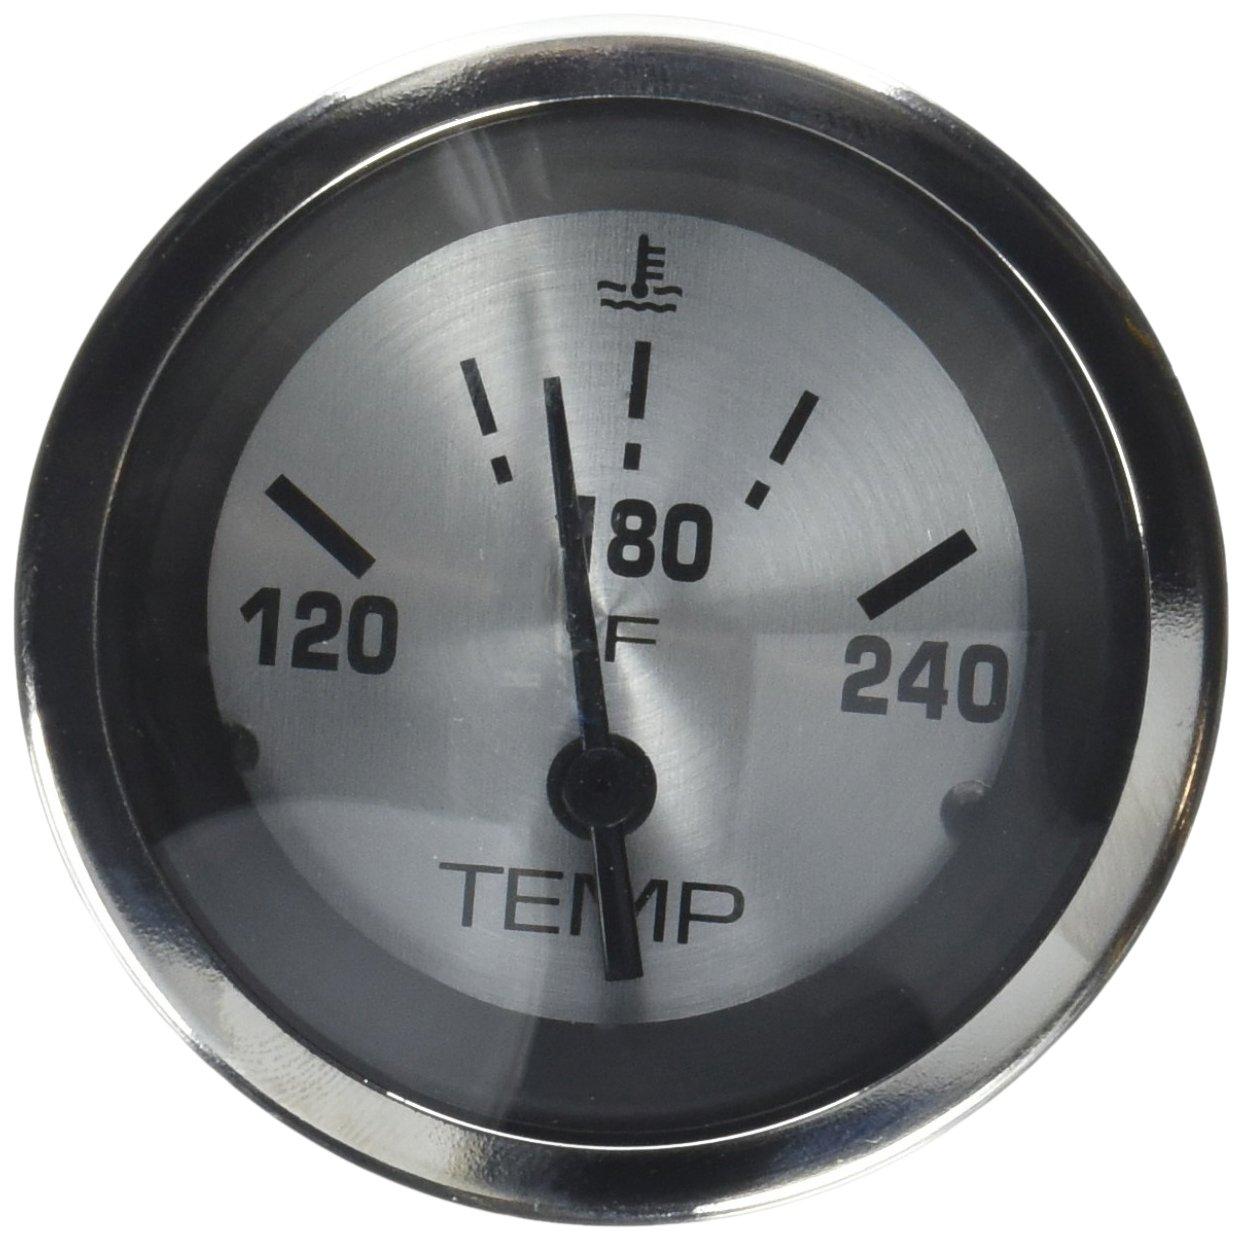 2 2 Teleflex Sierra International 63480P Sterling Scratch Resistant Water Temperature Gauge